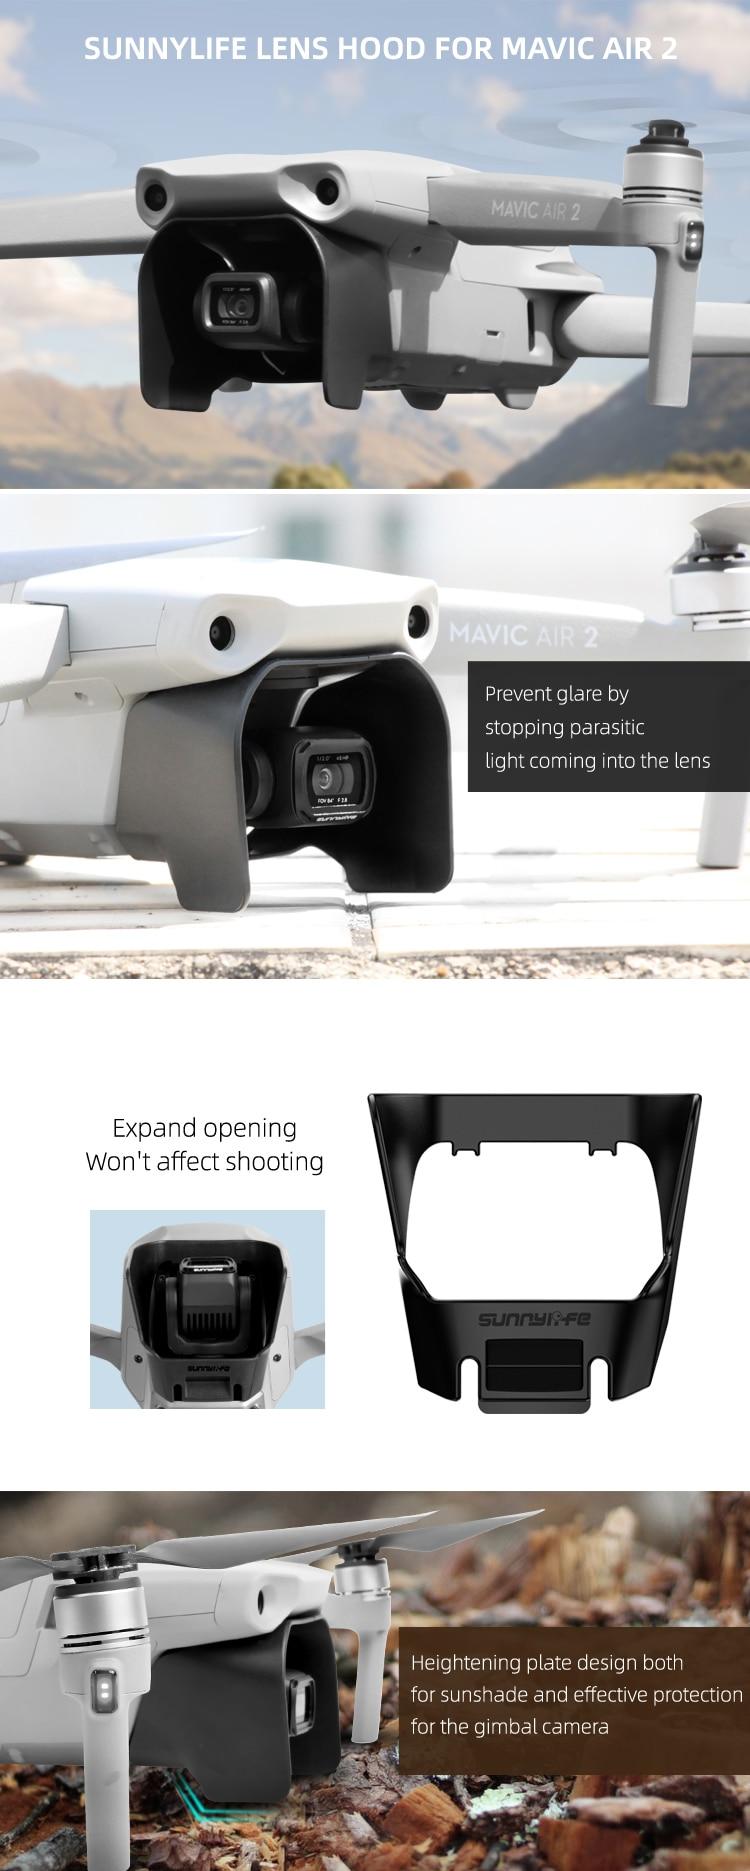 DJI Mavic Air 2 Drone Sunnylife Lens Hood  Sun Shade Hood Mavic Air 2 Accessory